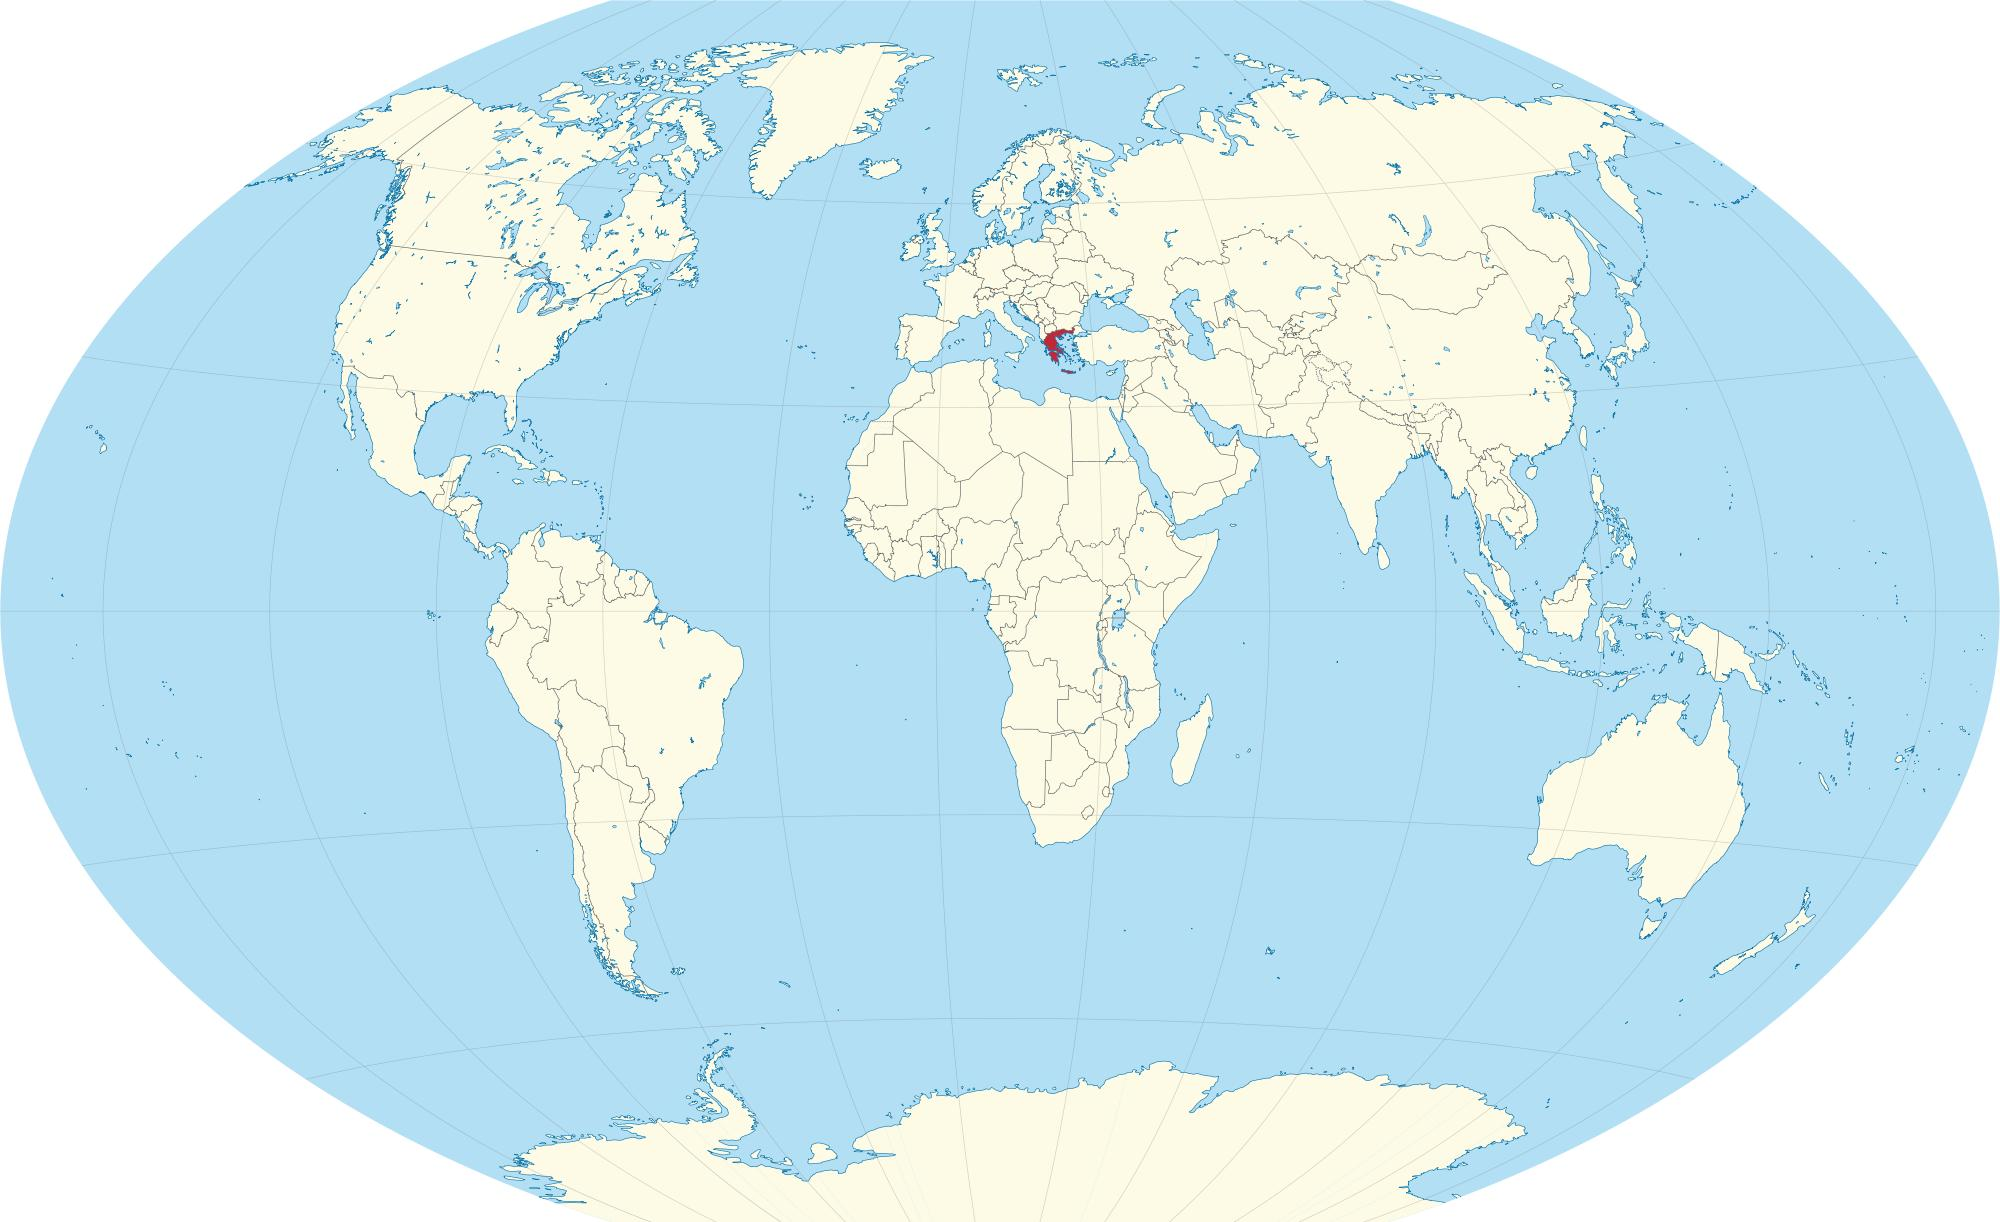 Greece on world map world map of greece southern europe europe world map of greece gumiabroncs Choice Image